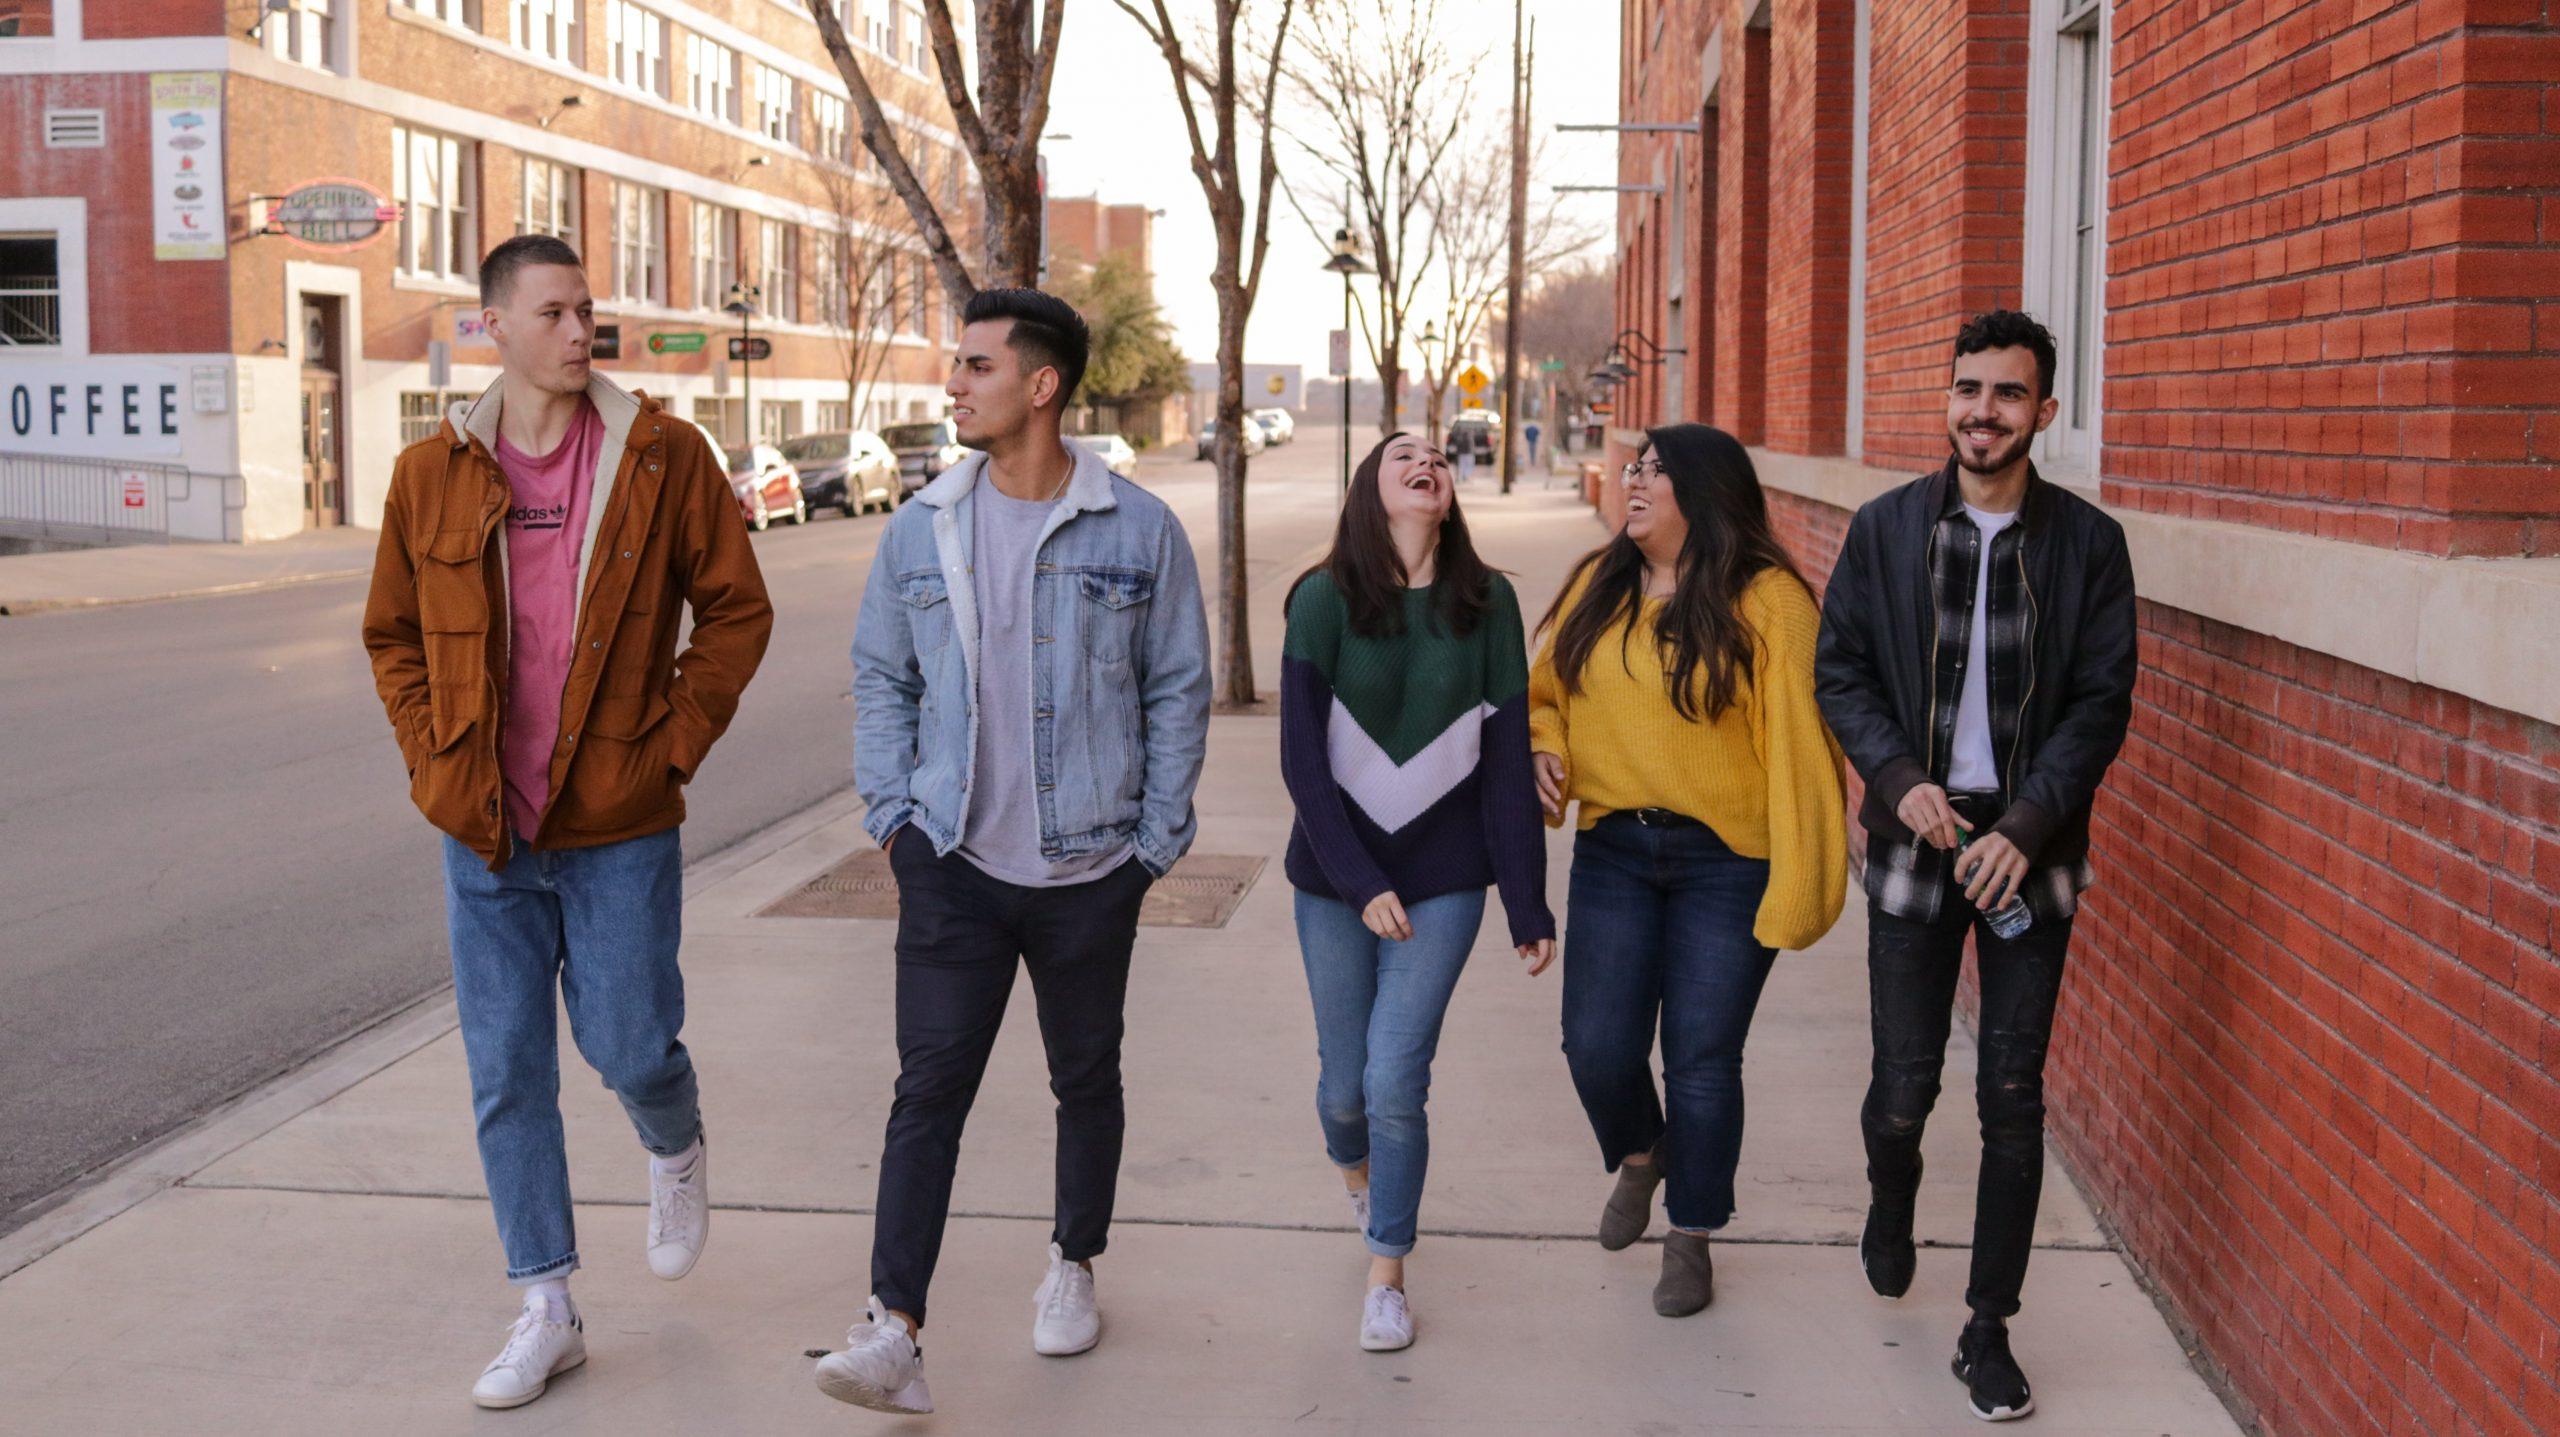 Image of 5 young people walking, talking, smiling, down an urban street.